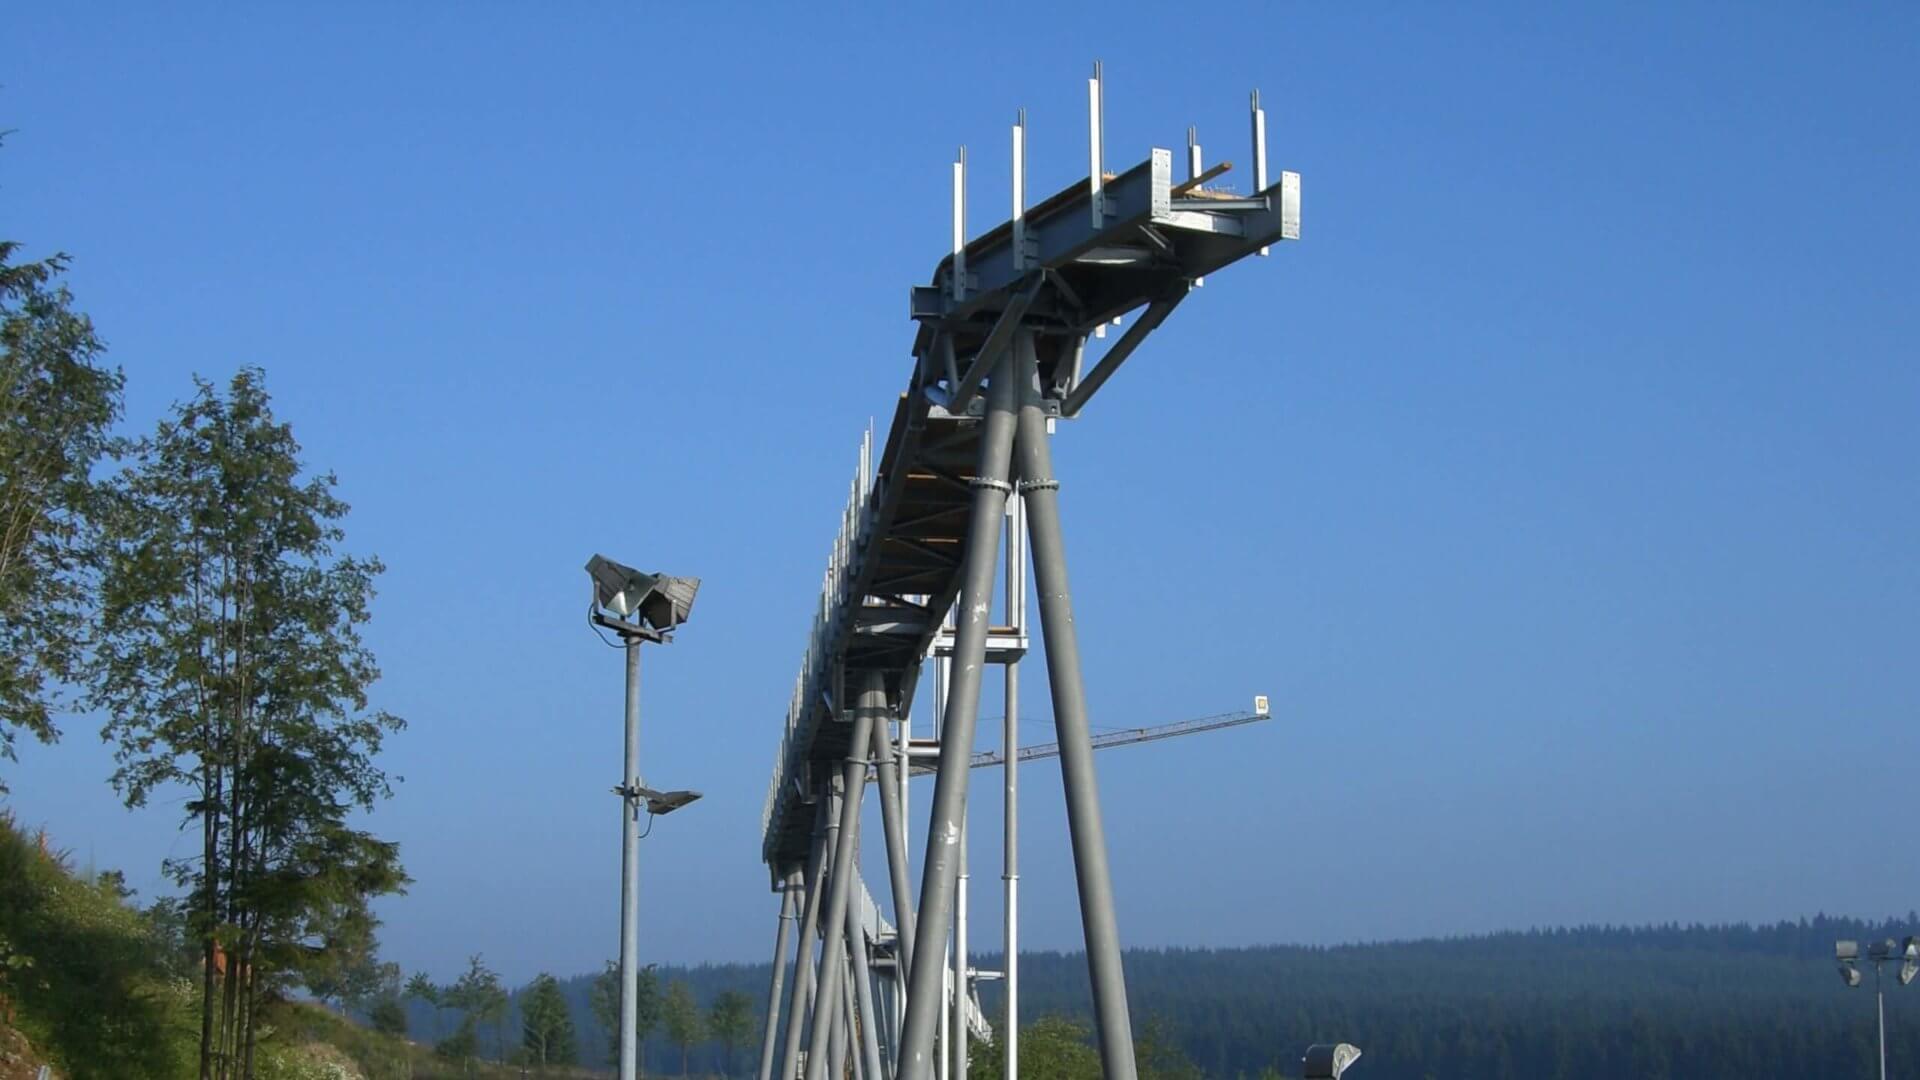 Panorama Erlebnis Brücke wird am Erlebnisberg Kappe gebaut